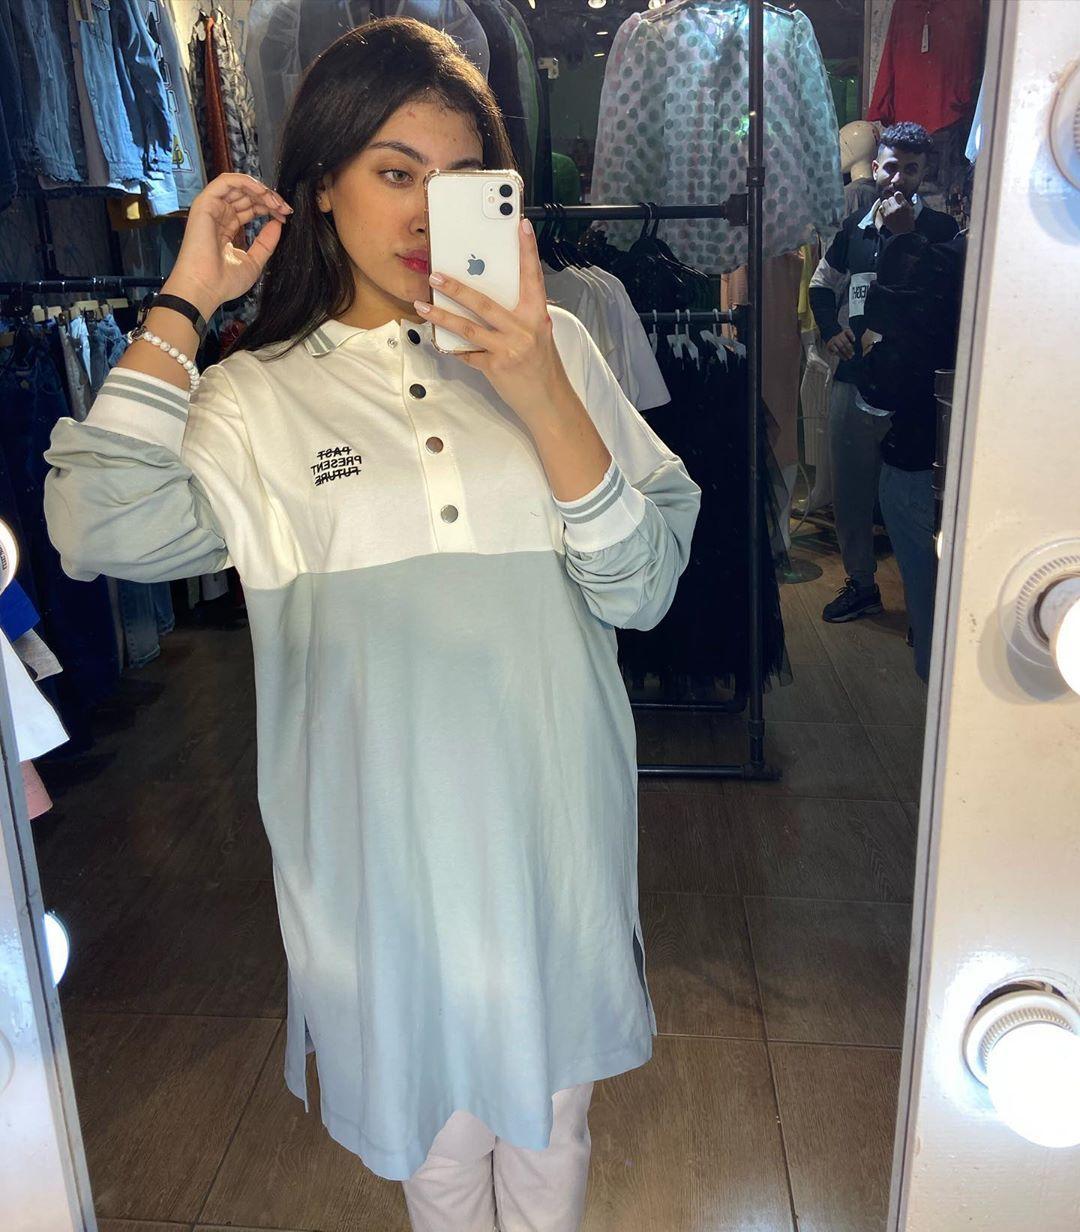 Instagram Photo By Everyday Jun 29 2020 At 2 46 Am Shirt Dress Tshirt Dress Fashion